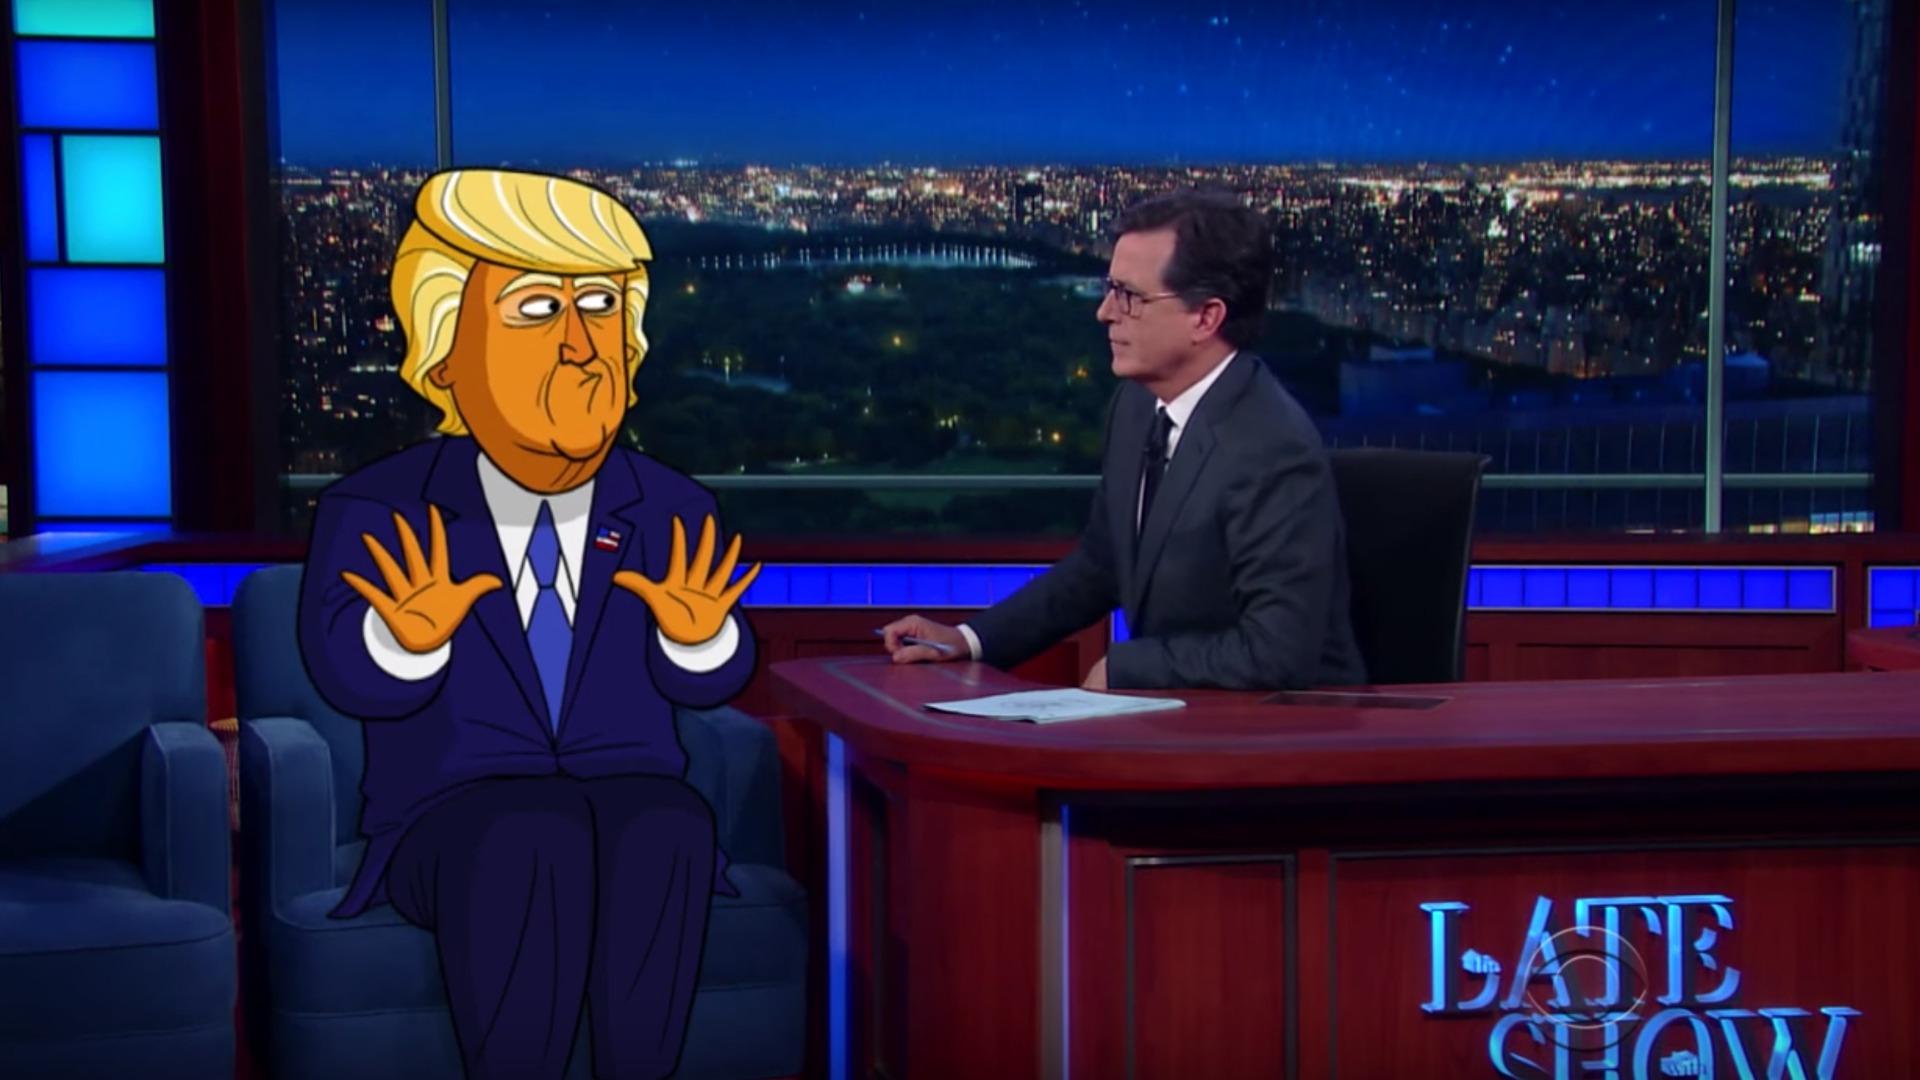 A: Cartoon Trump!